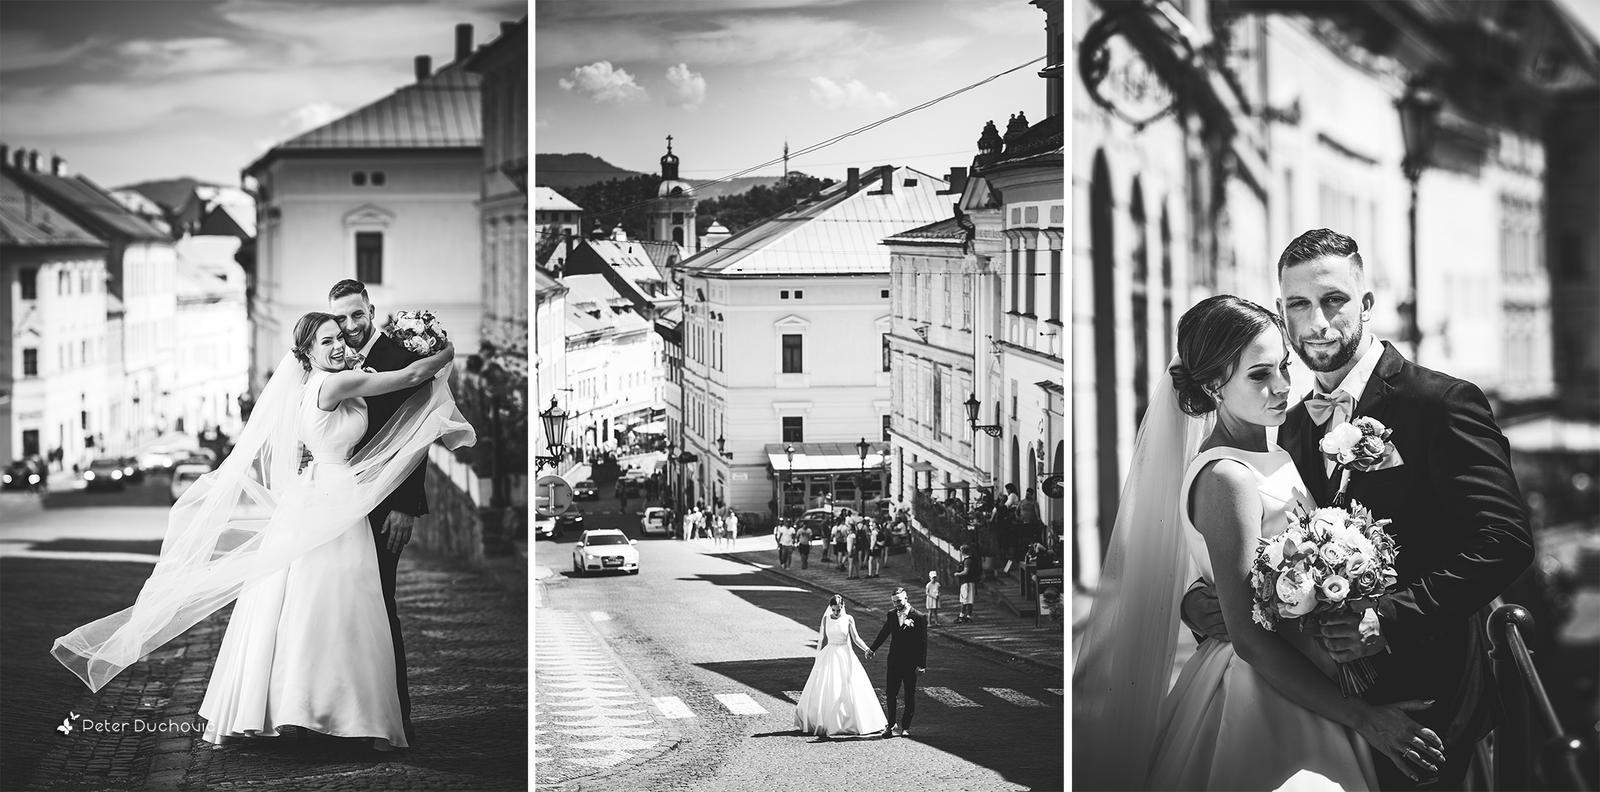 Svadba Lujza a Tomáš - Obrázok č. 6